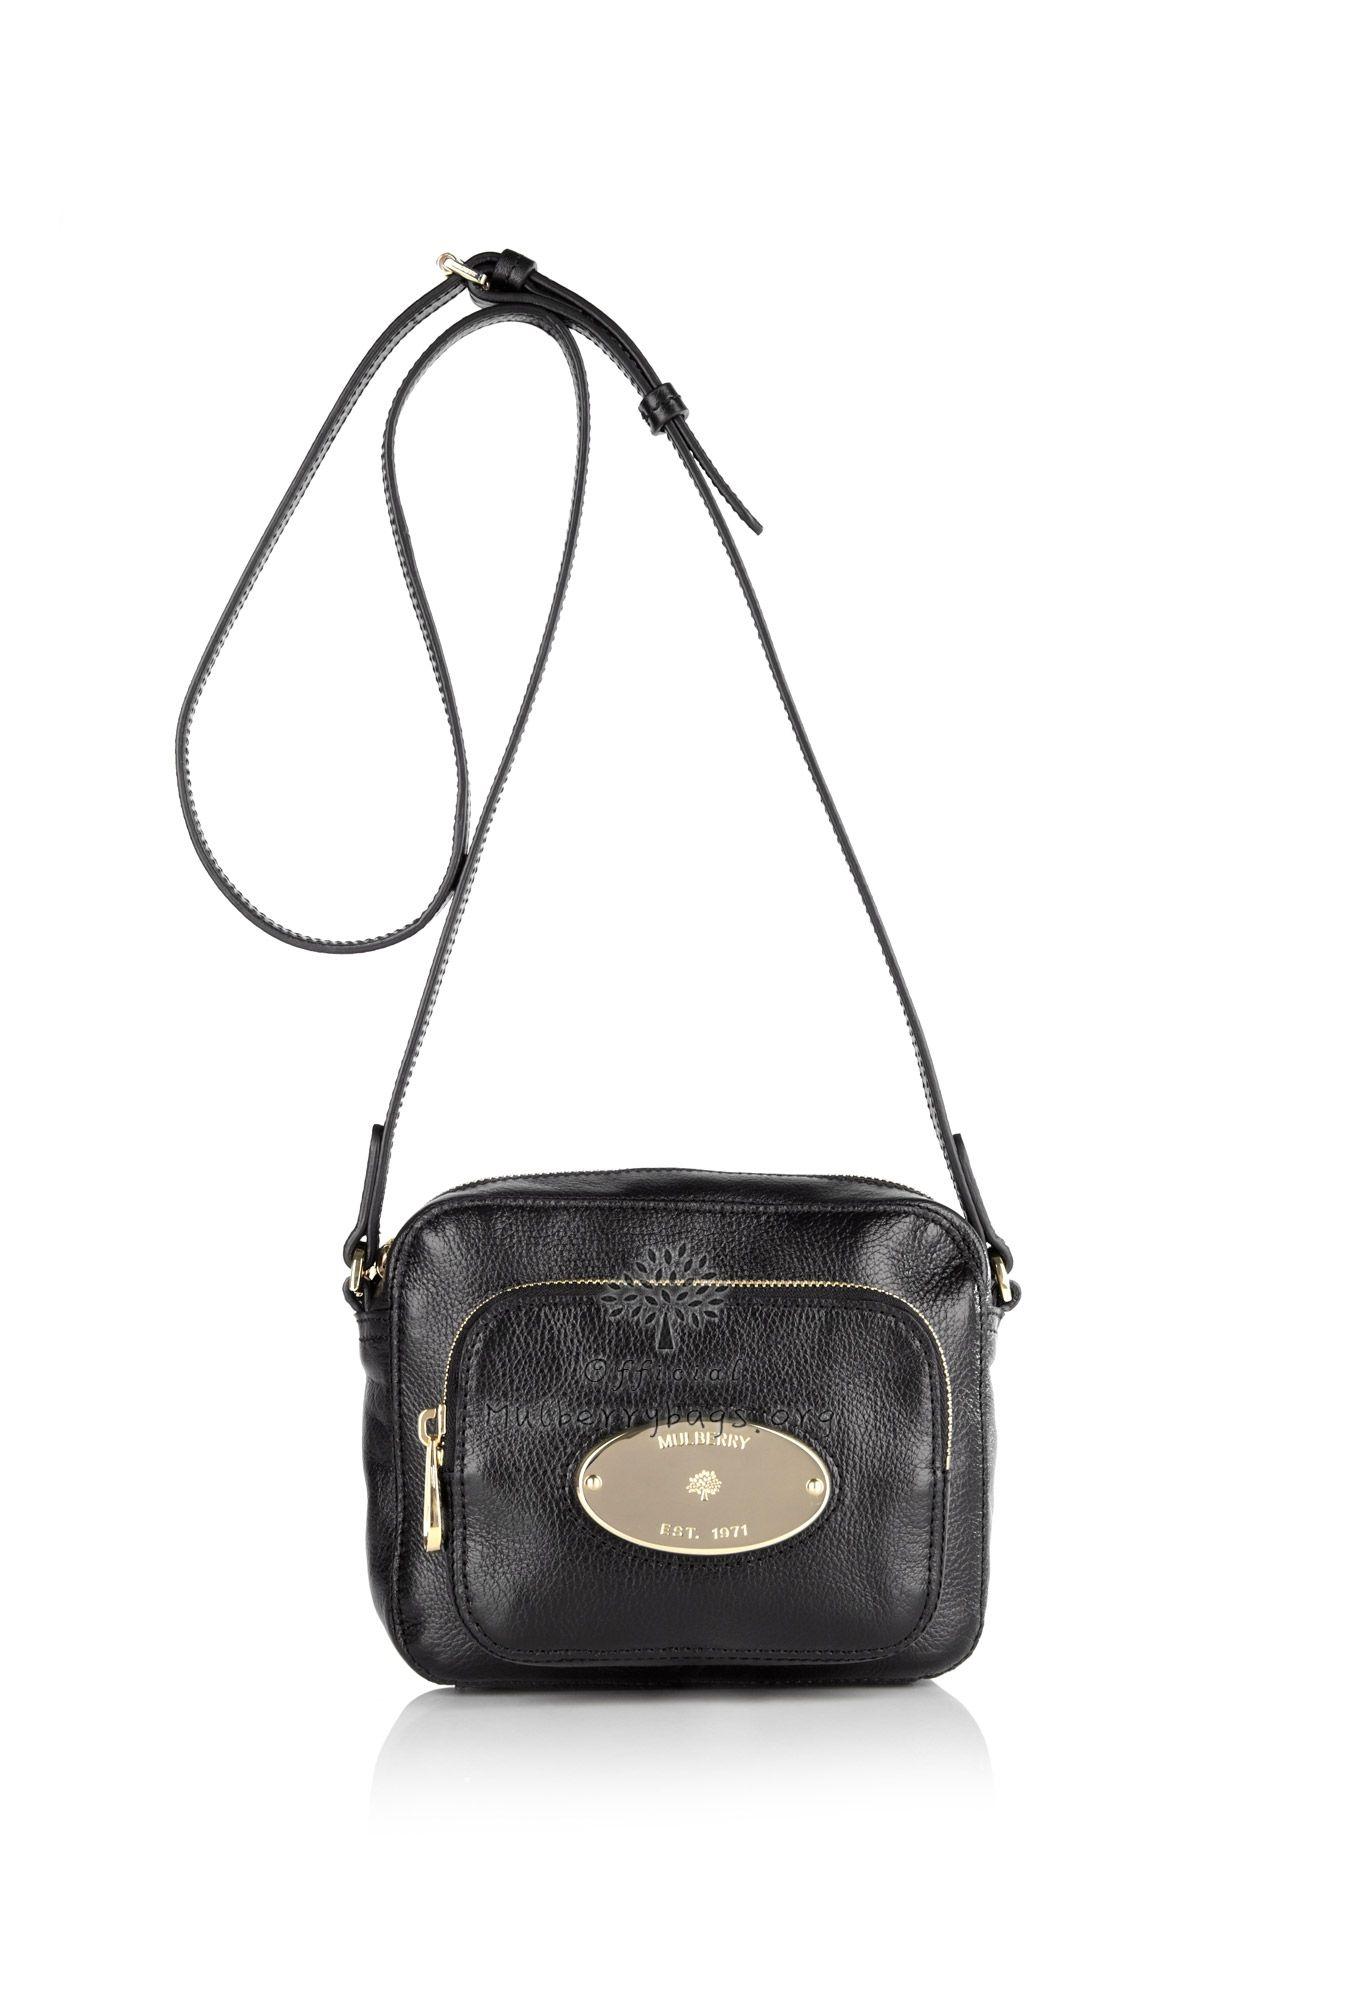 855c31eb9d Mulberry Gracie Crossbody Bag | My Style Pinboard | Bags, Crossbody ...